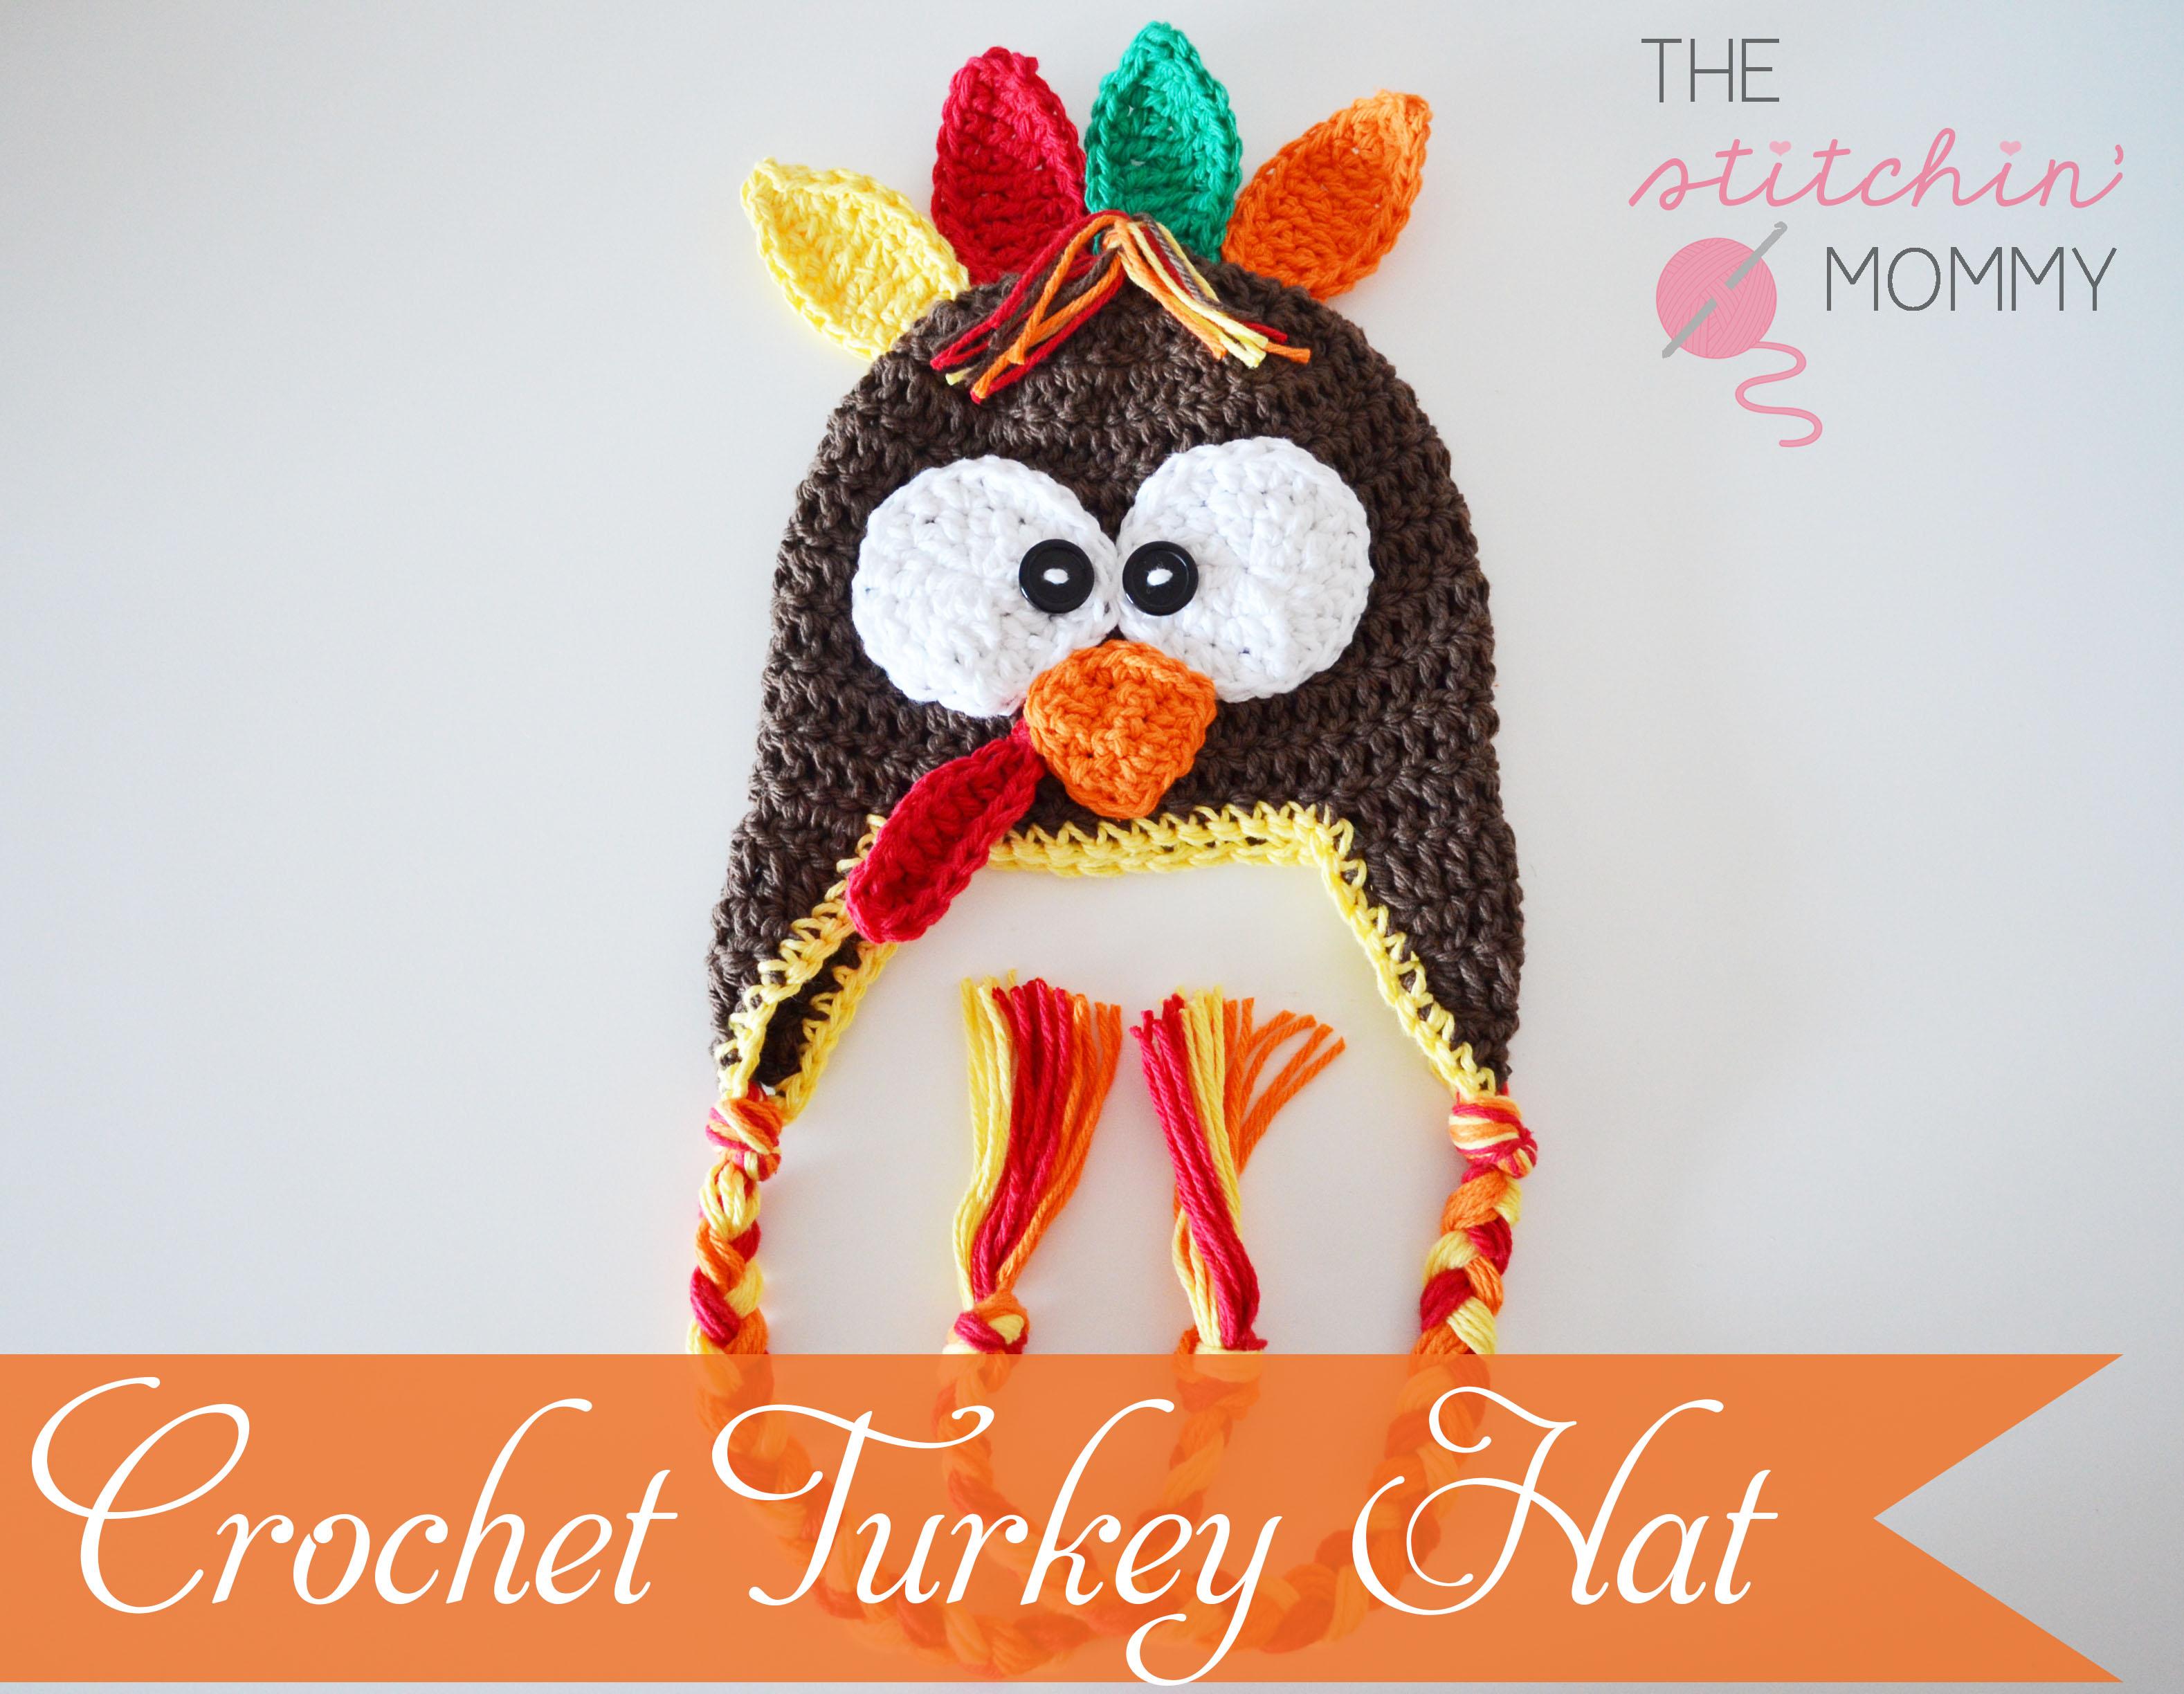 Crochet Turkey Hat - Free Pattern - The Stitchin Mommy